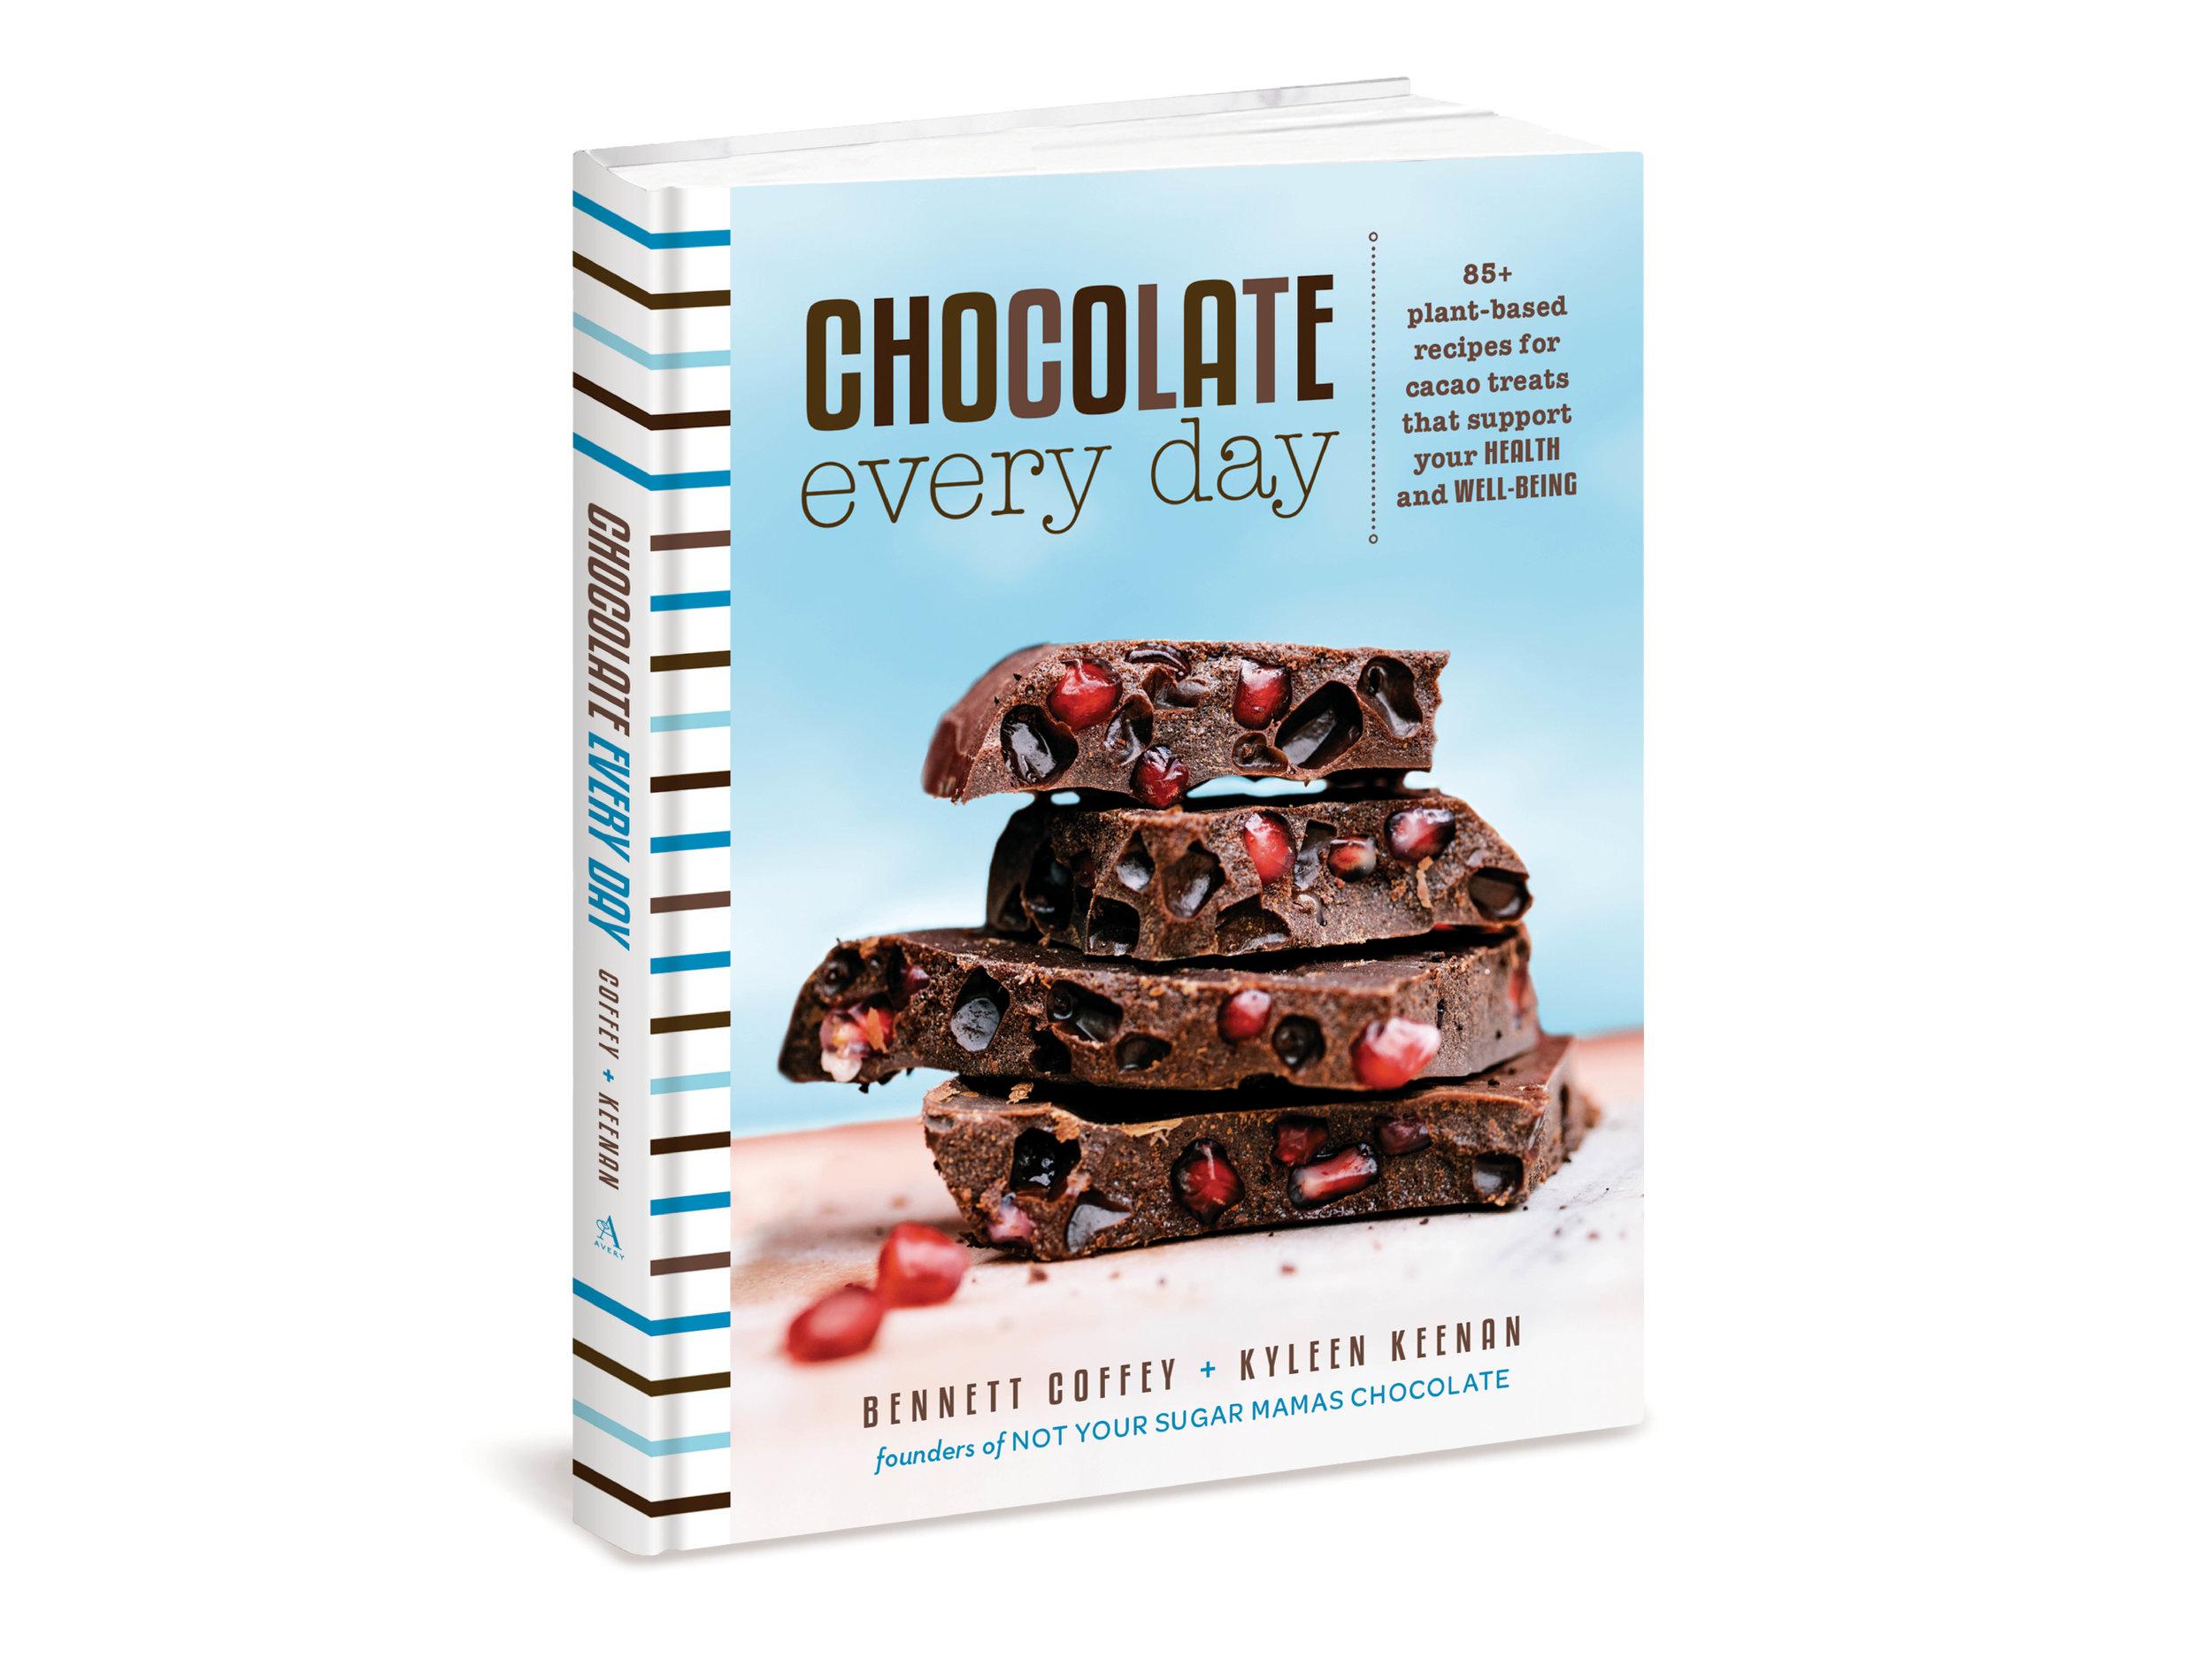 ChocolateEveryDay-1.jpg